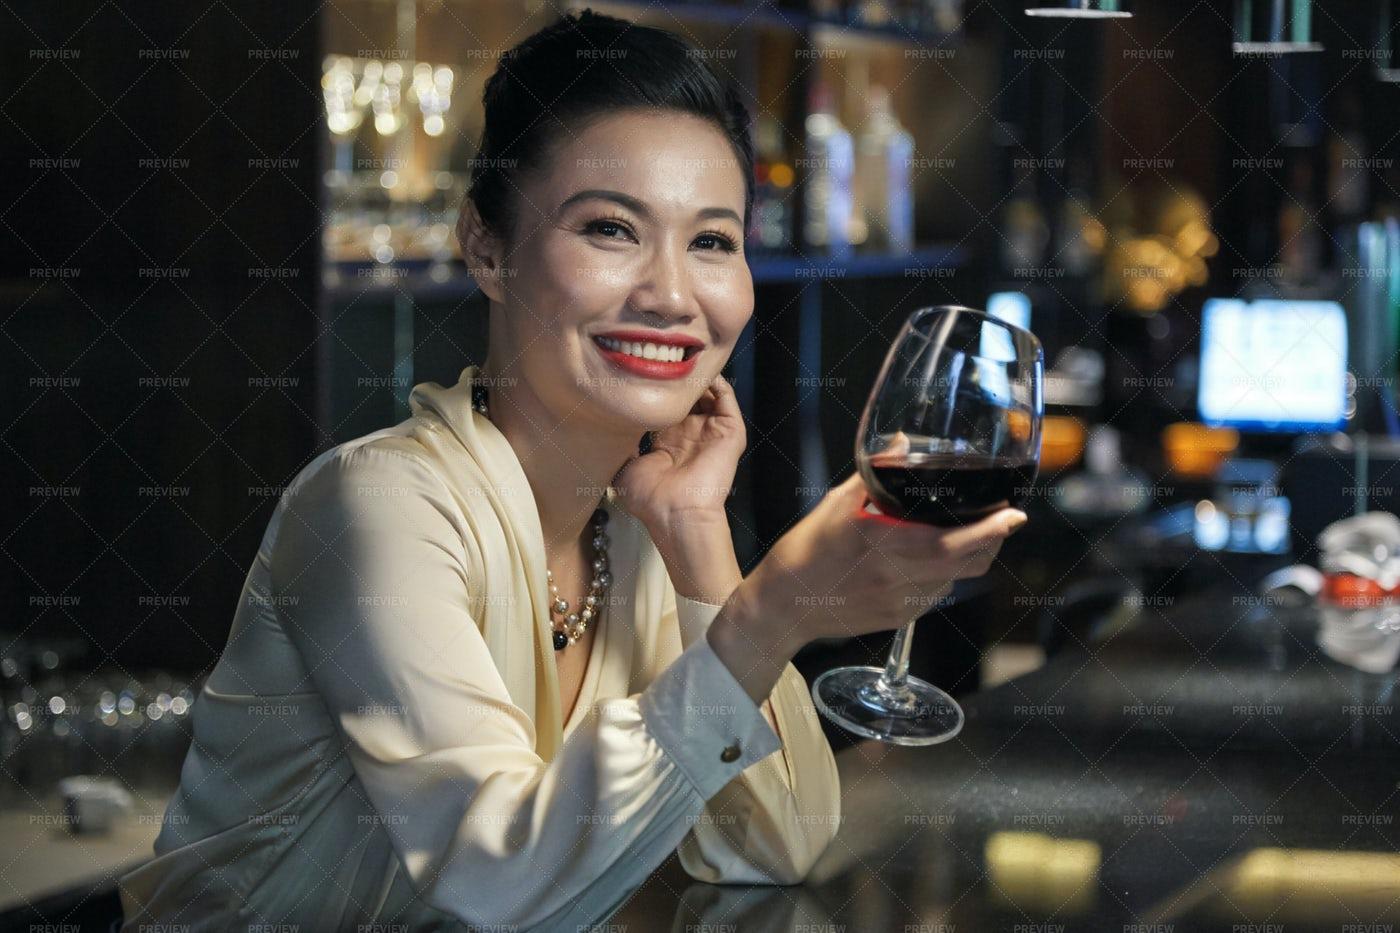 Smiling Elegant Asian Female With...: Stock Photos